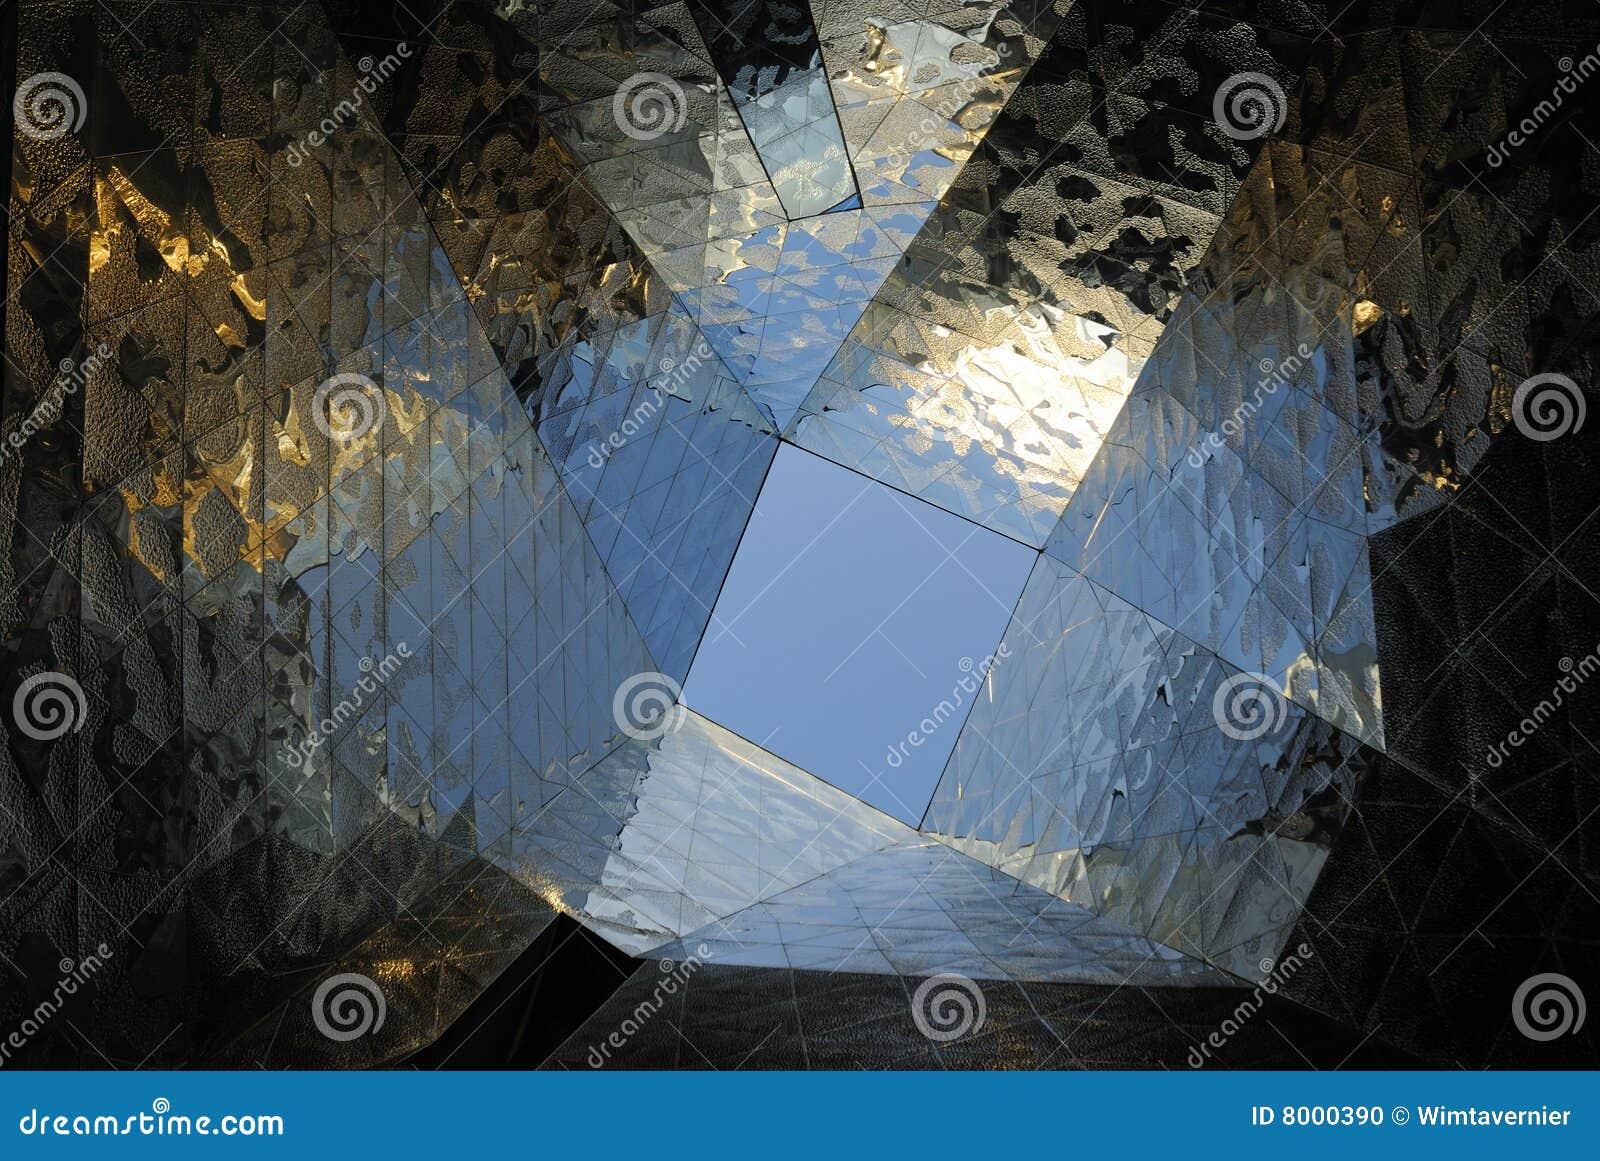 Detalhes arquitectónicos abstratos